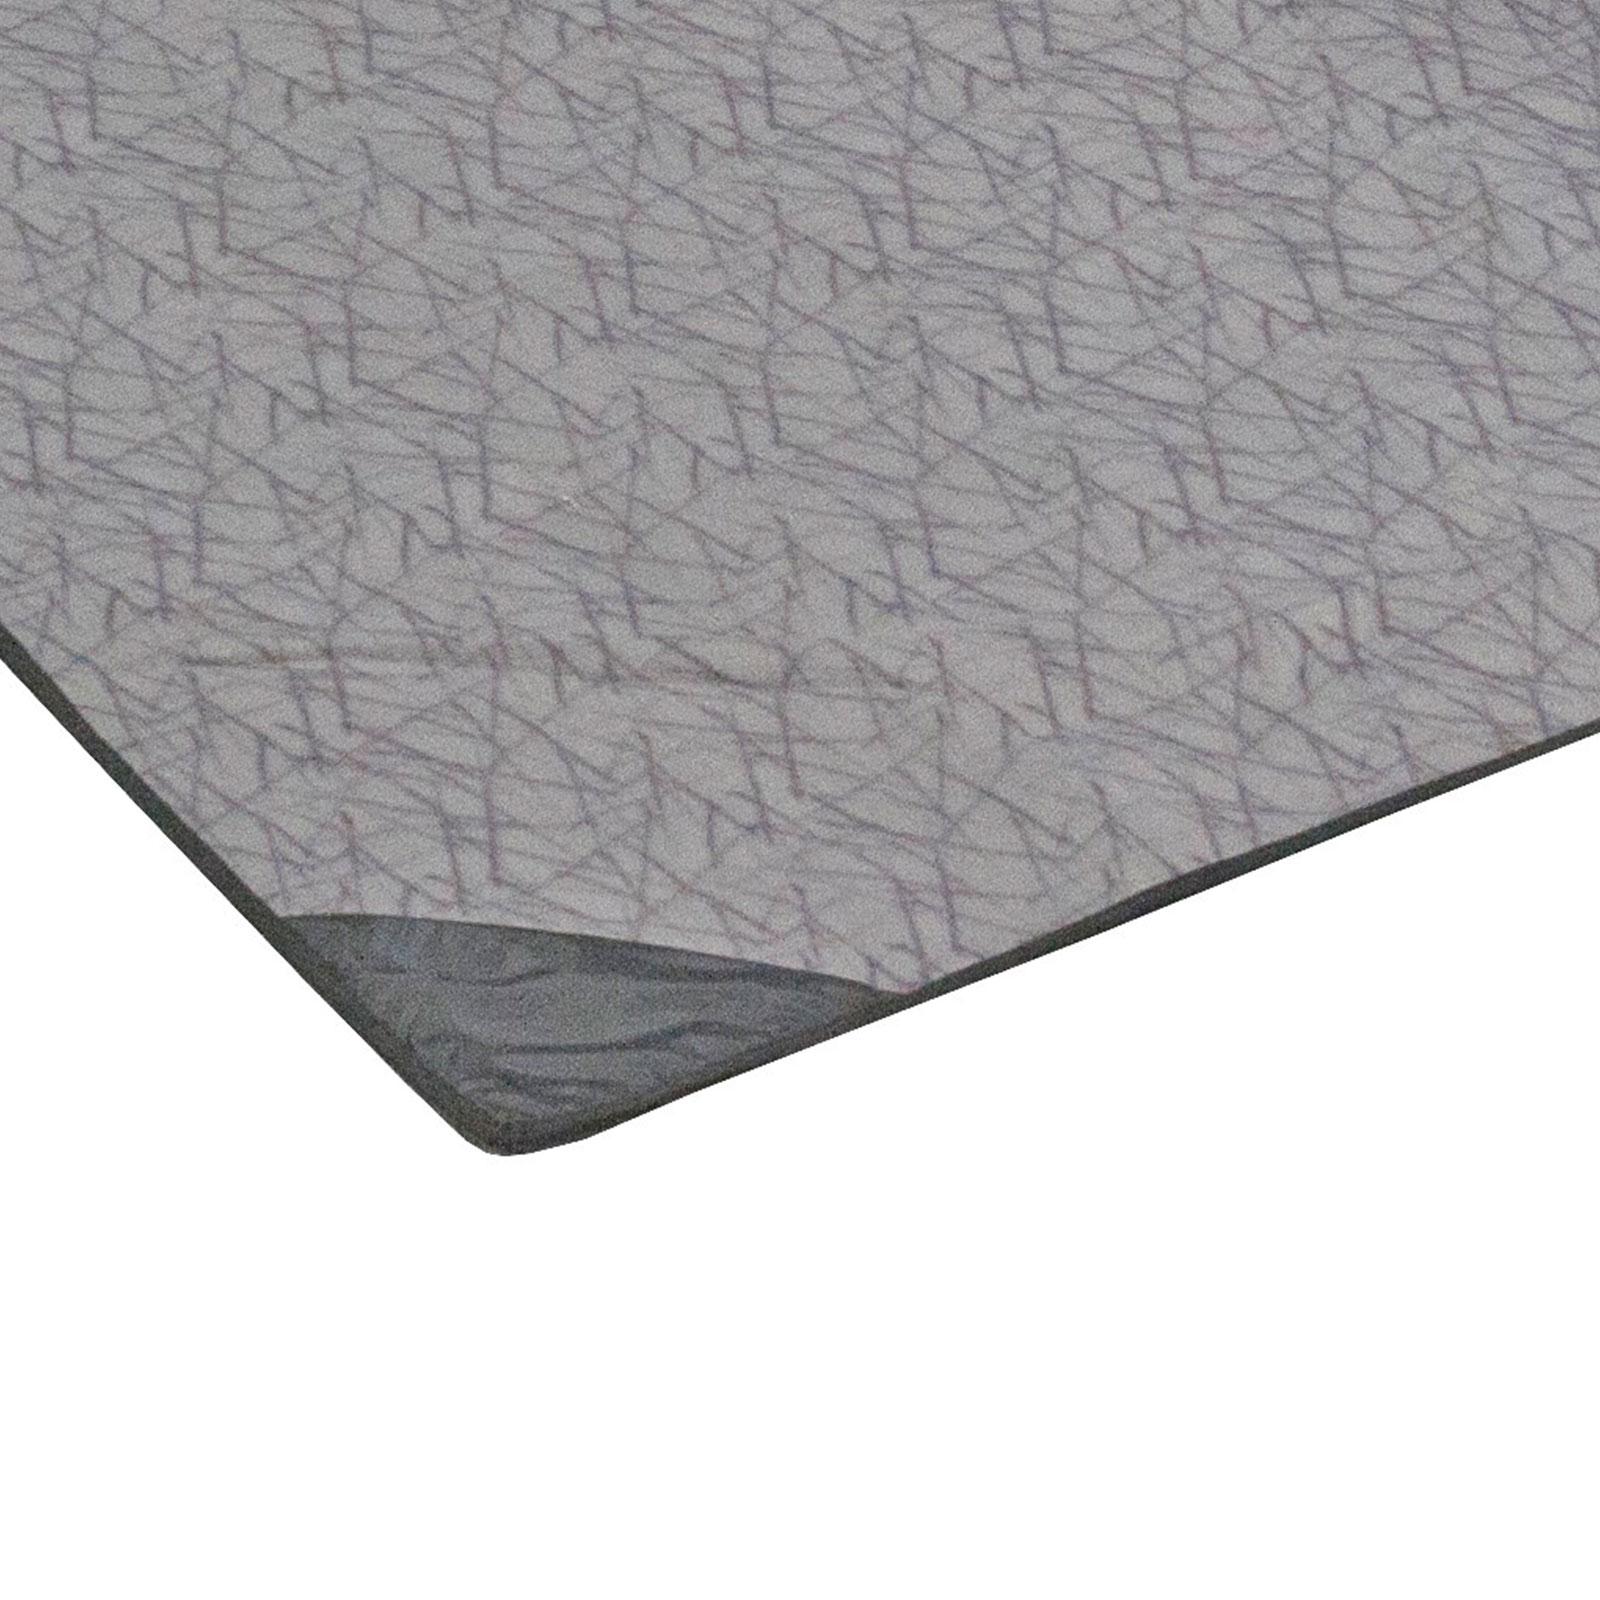 VANGO Zeltteppich Zeltteppich VANGO Universal Zelt Teppich Nylonteppich Einlegeboden Zeltboden NEU 25e038